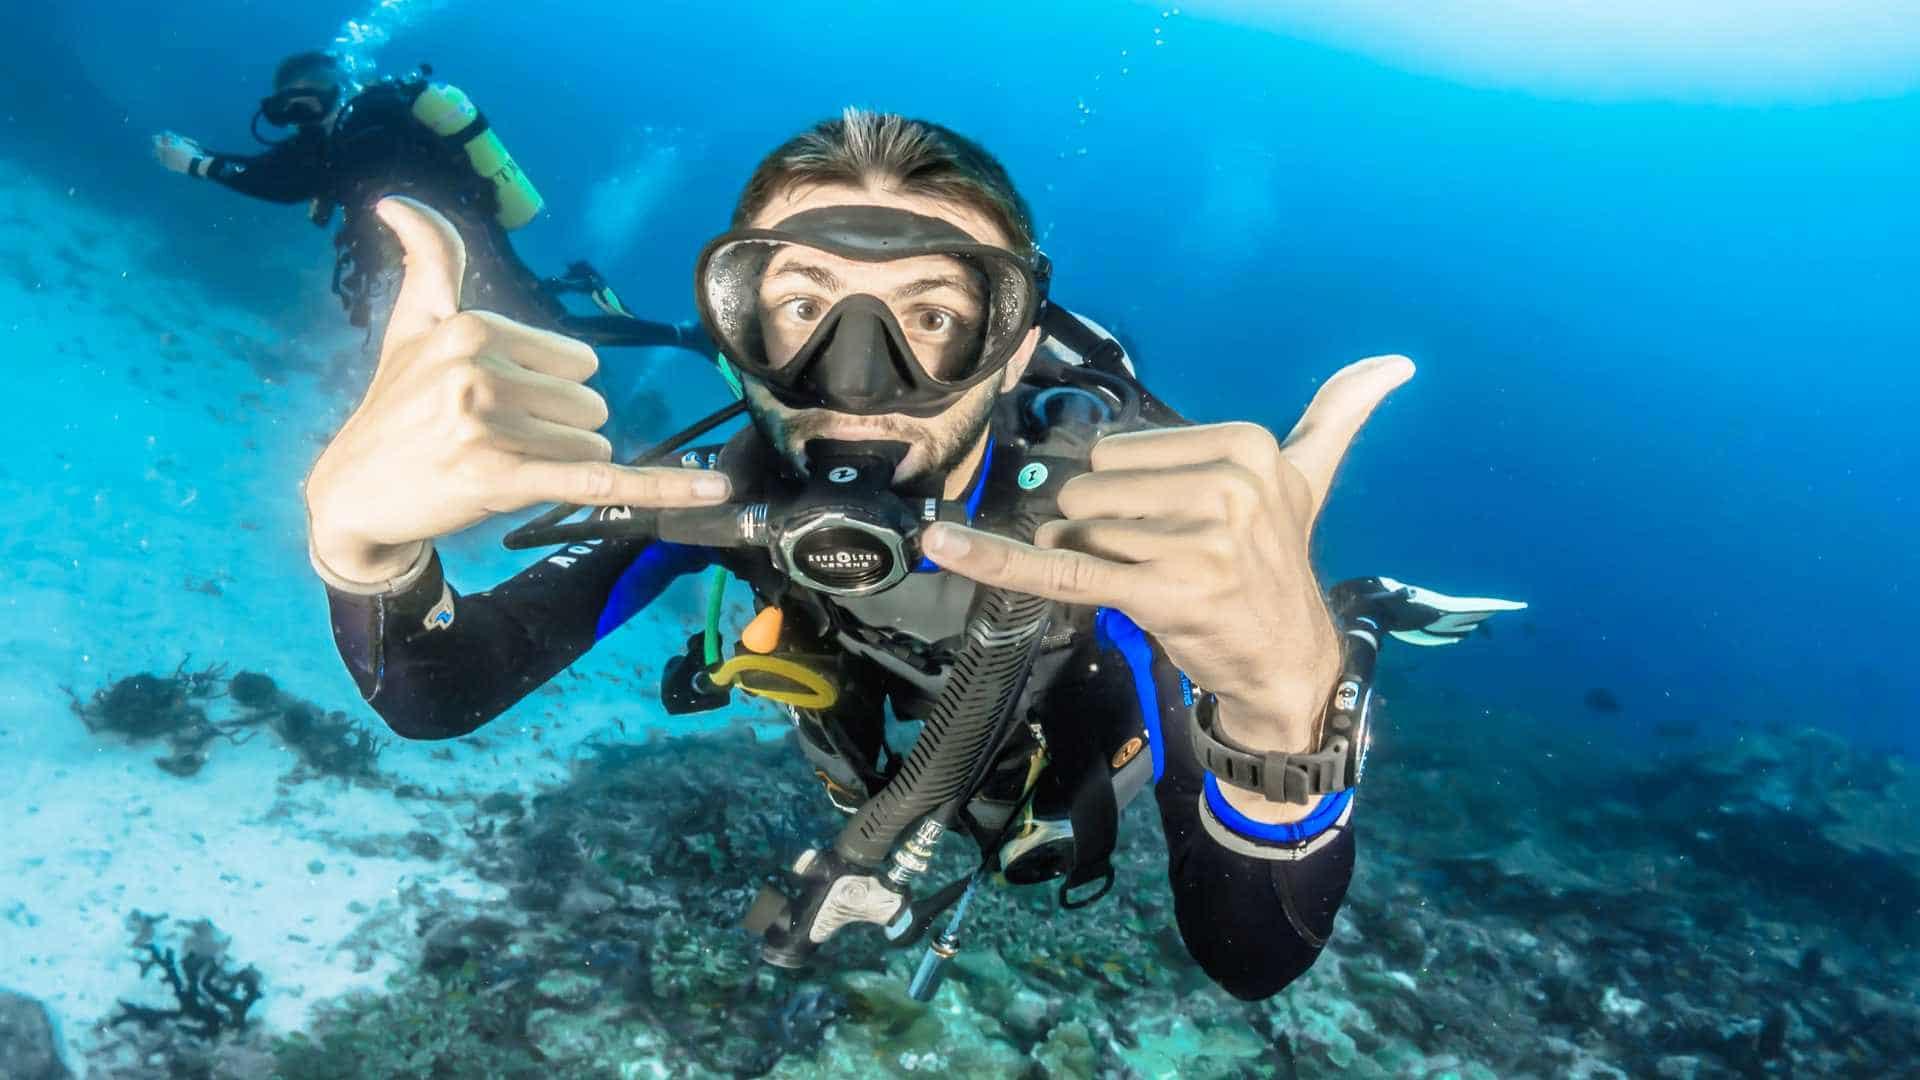 Happy scuba diver making surfer hand signals underwater.